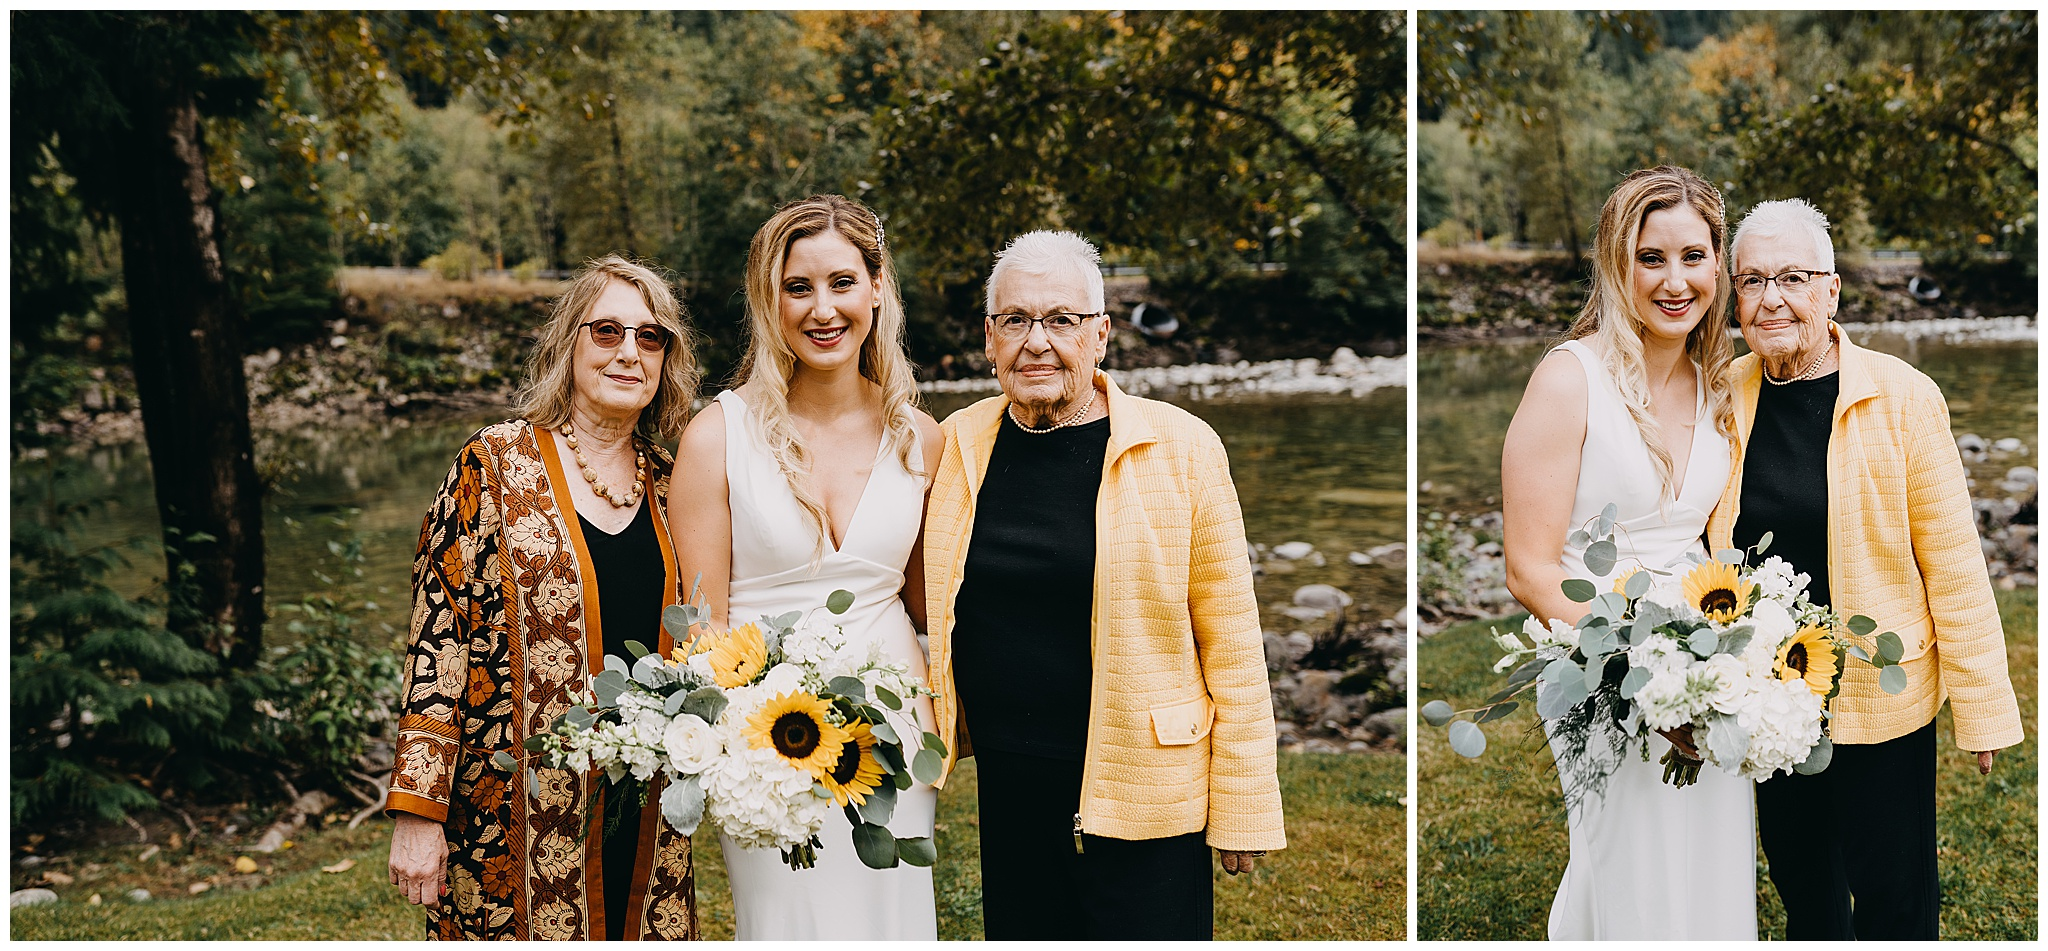 index-wa-wedding35.jpg